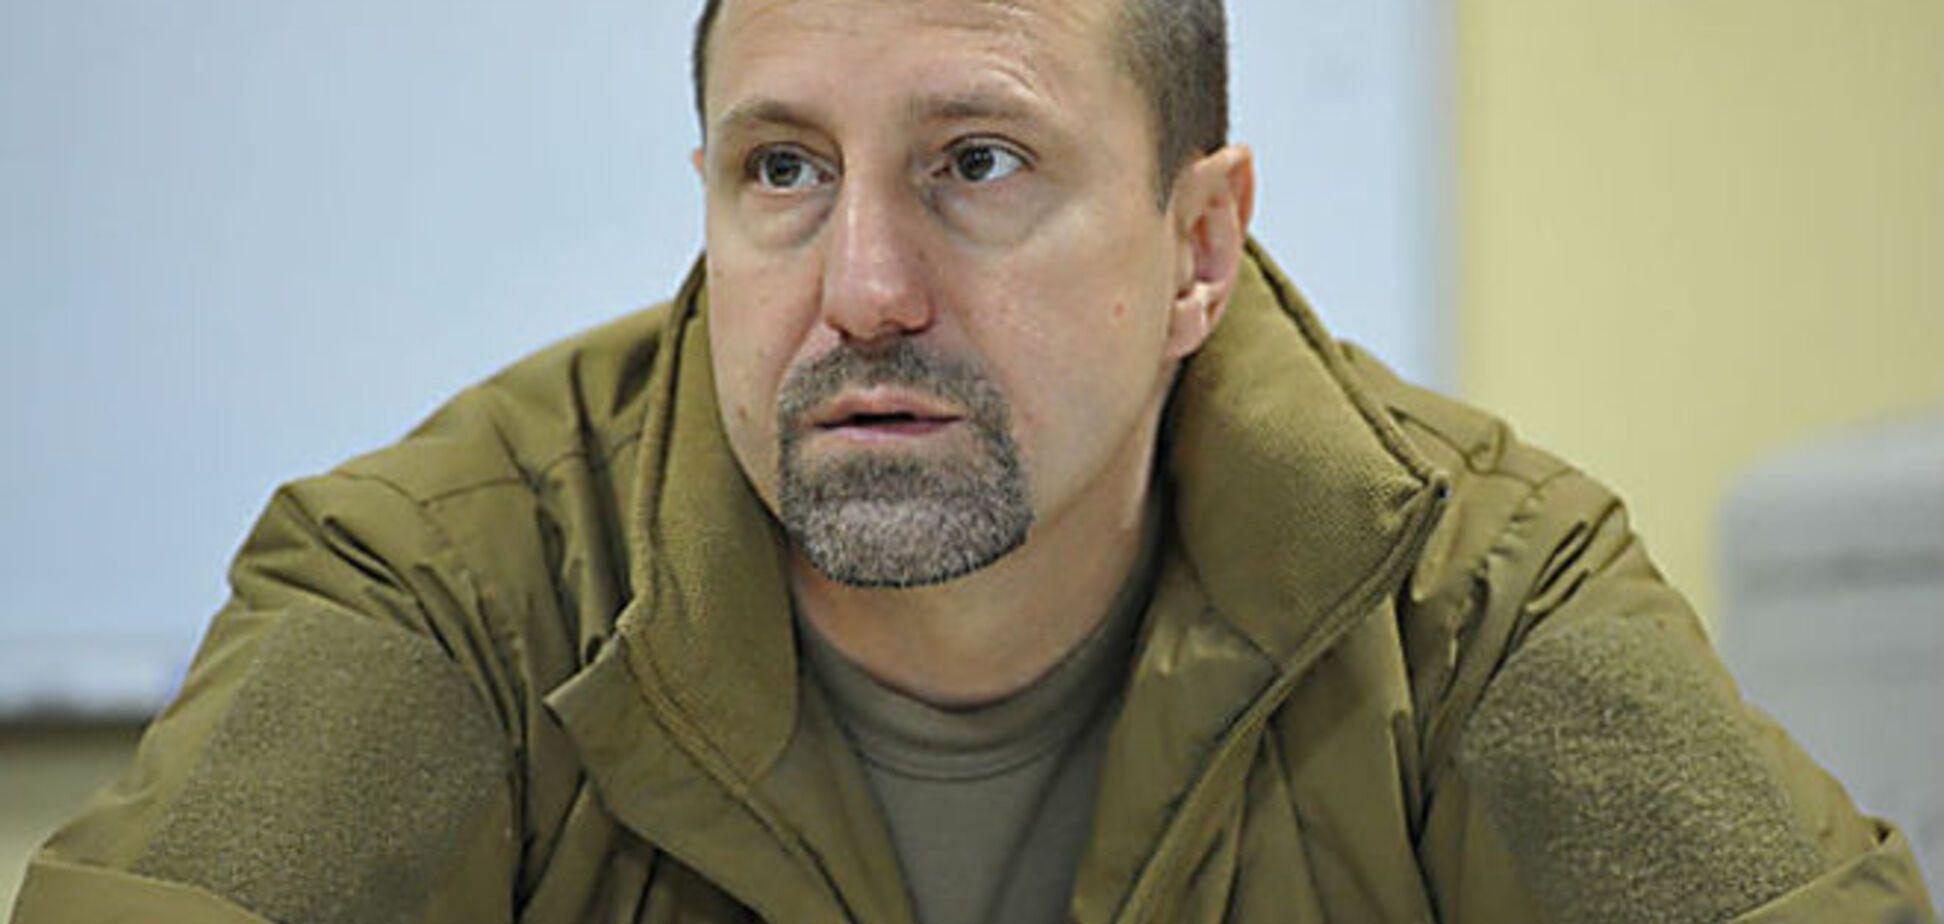 Не Украина! Террорист Ходаковский объявил главного врага в войне на Донбассе